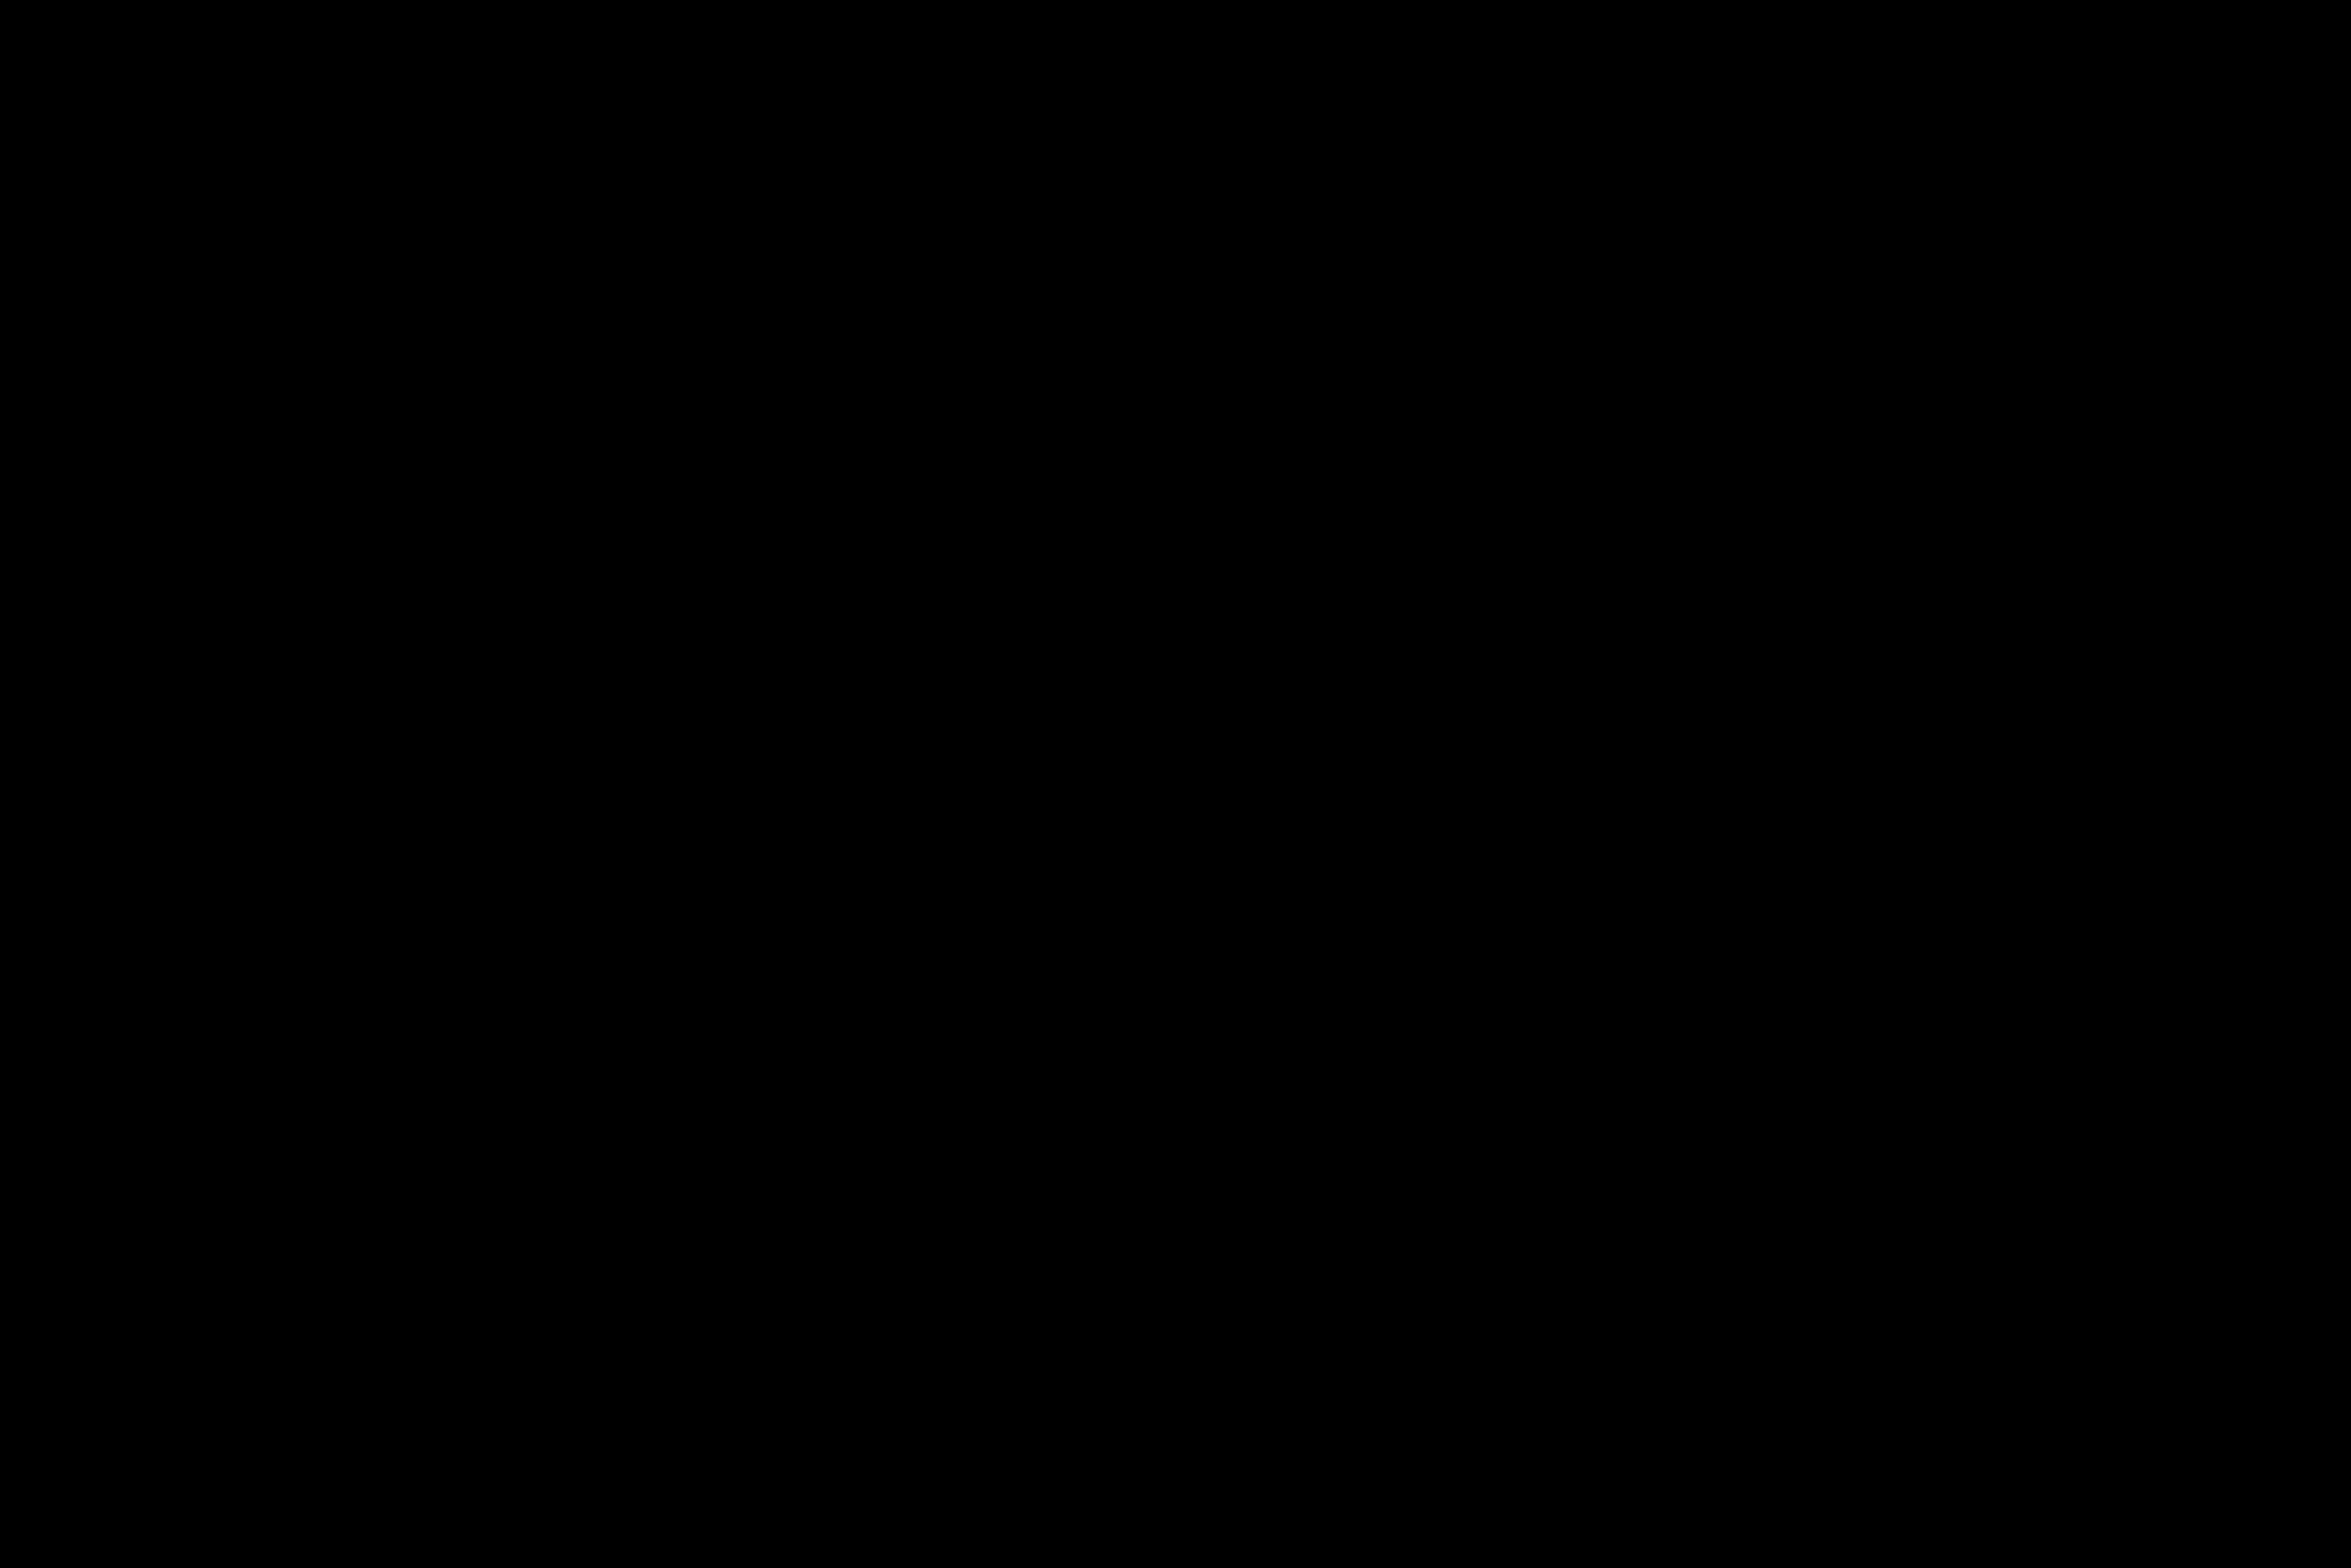 rj0319